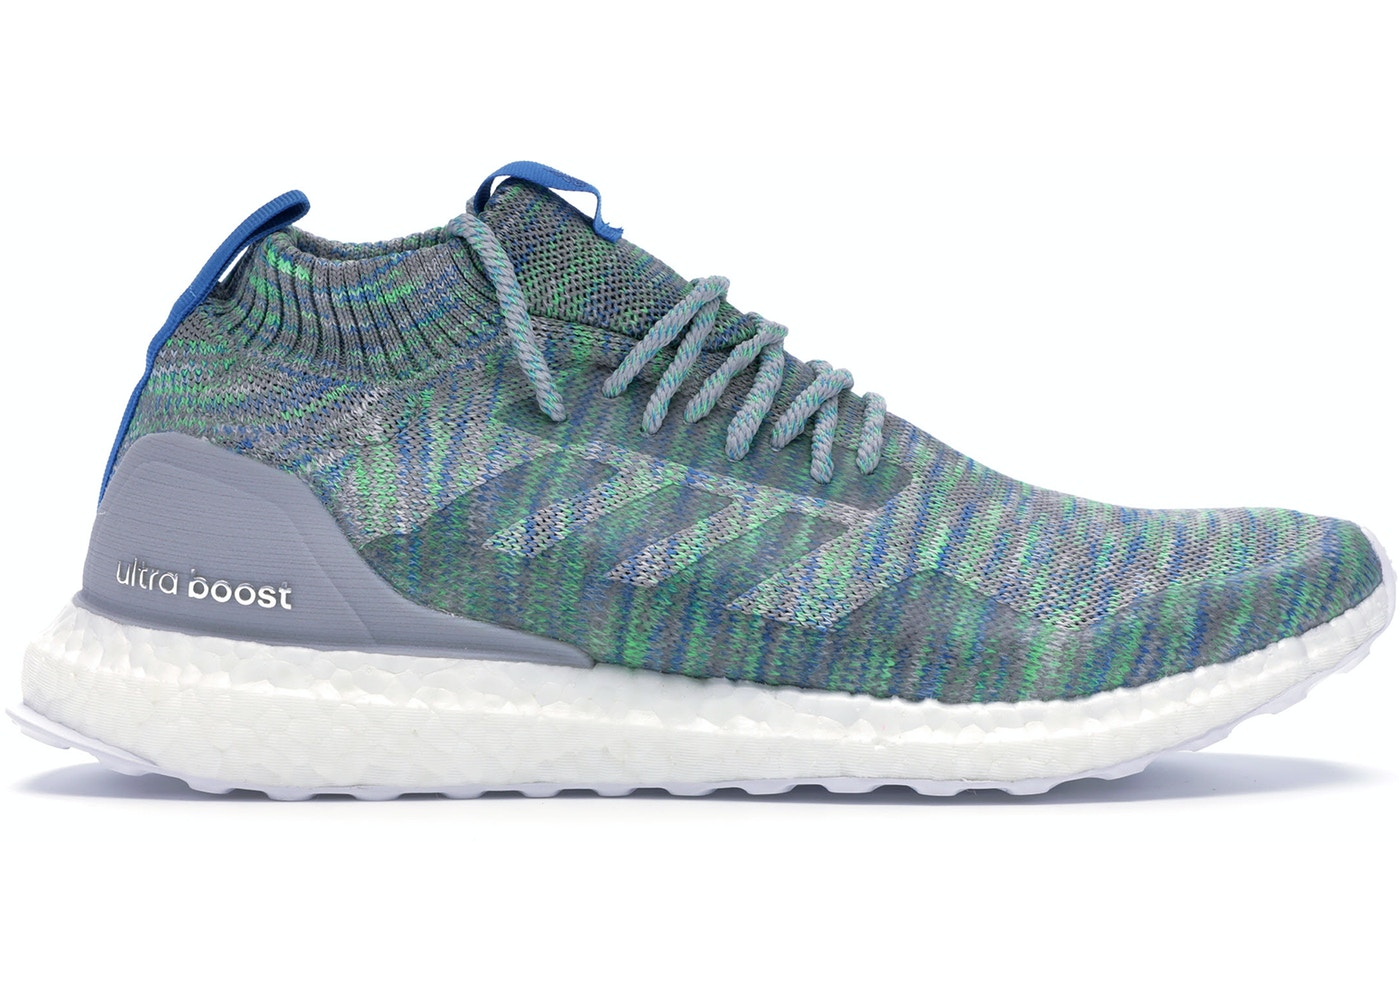 09677f468 adidas Ultra Boost Mid Multi-Color Grey - G26844